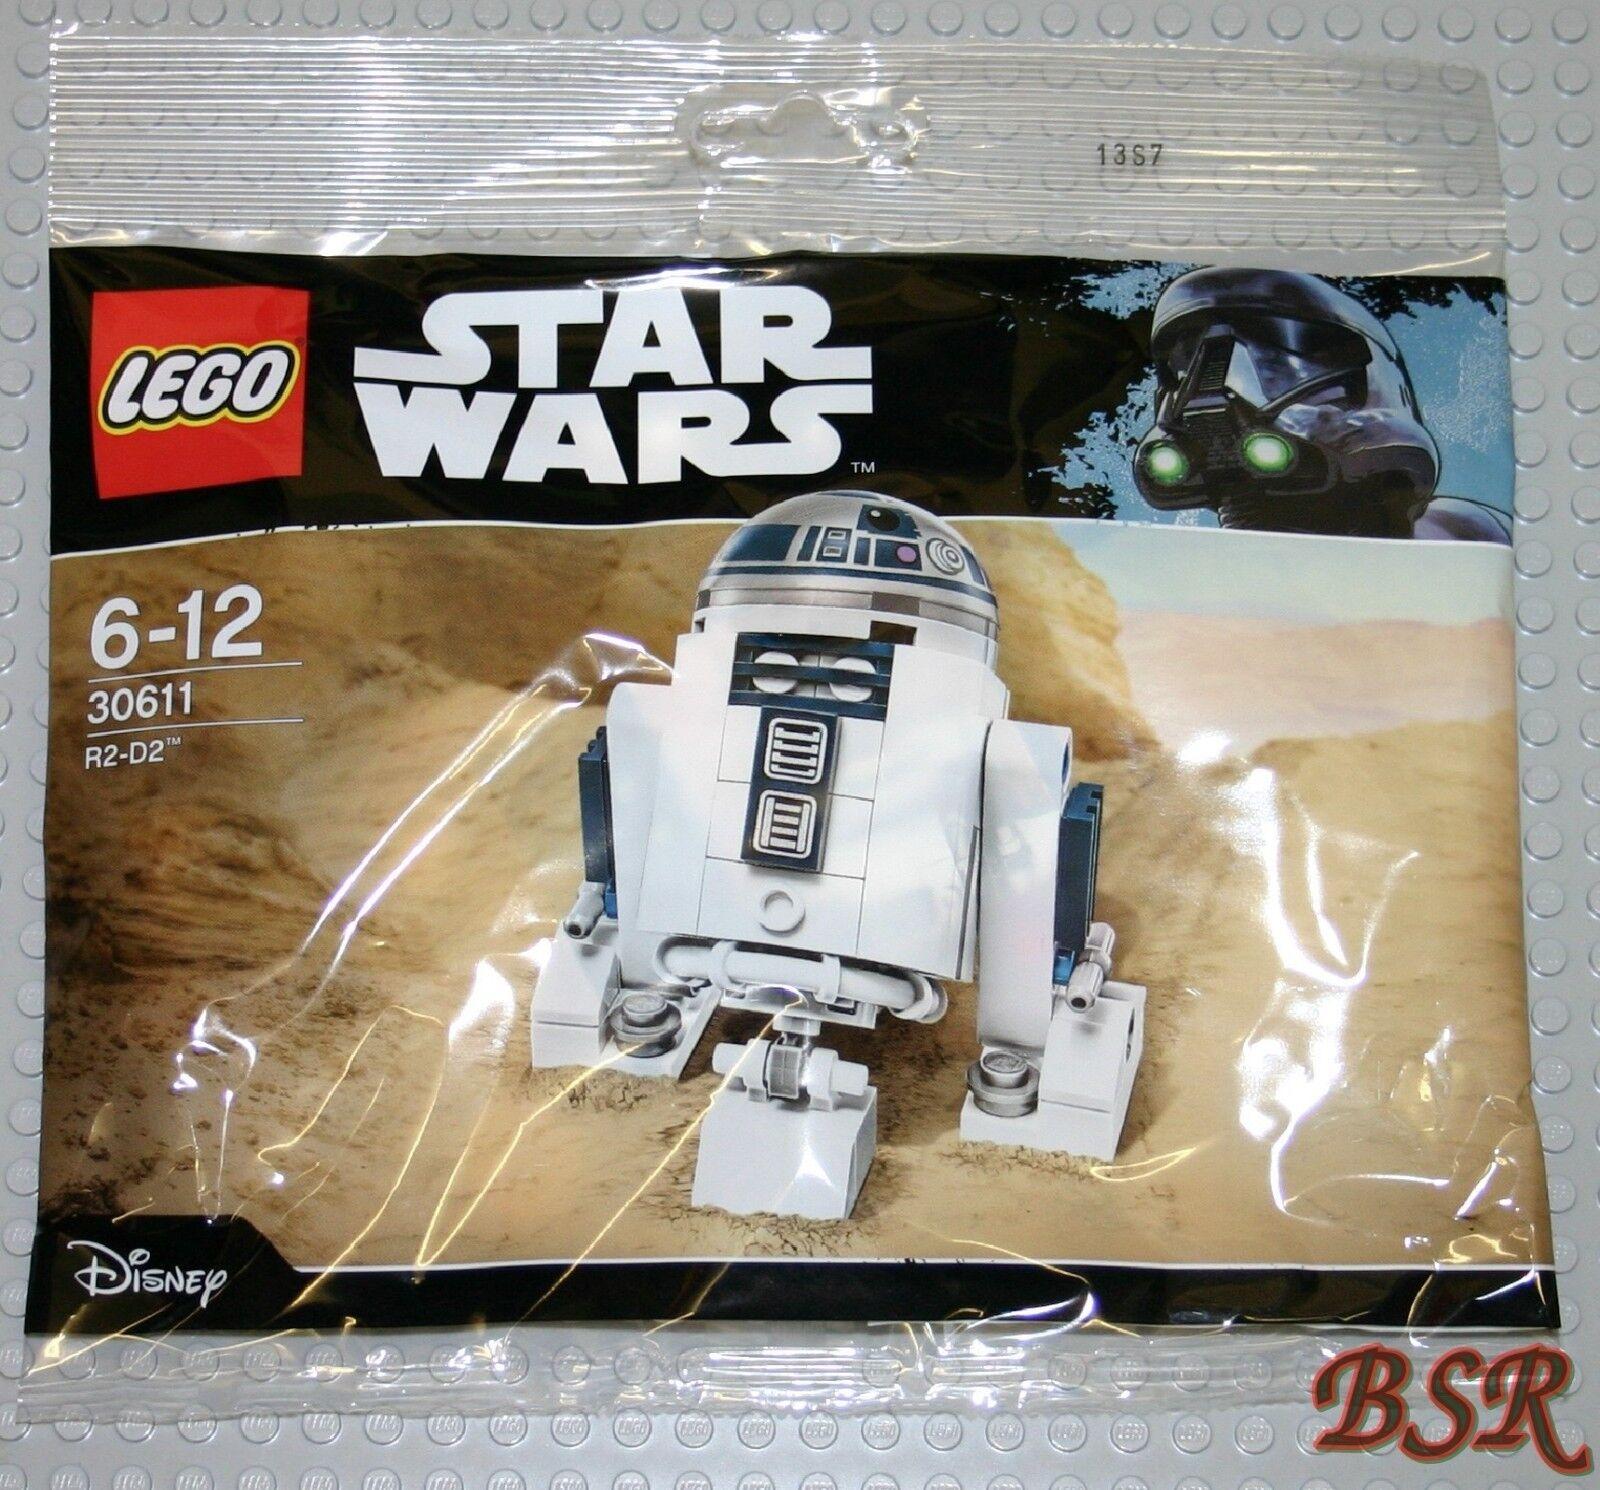 30 pezzi LEGO ® Star Wars PolyBorsa: 30611 r2-d2/r2d2 & 0.€ Spedizione & NUOVO & OVP